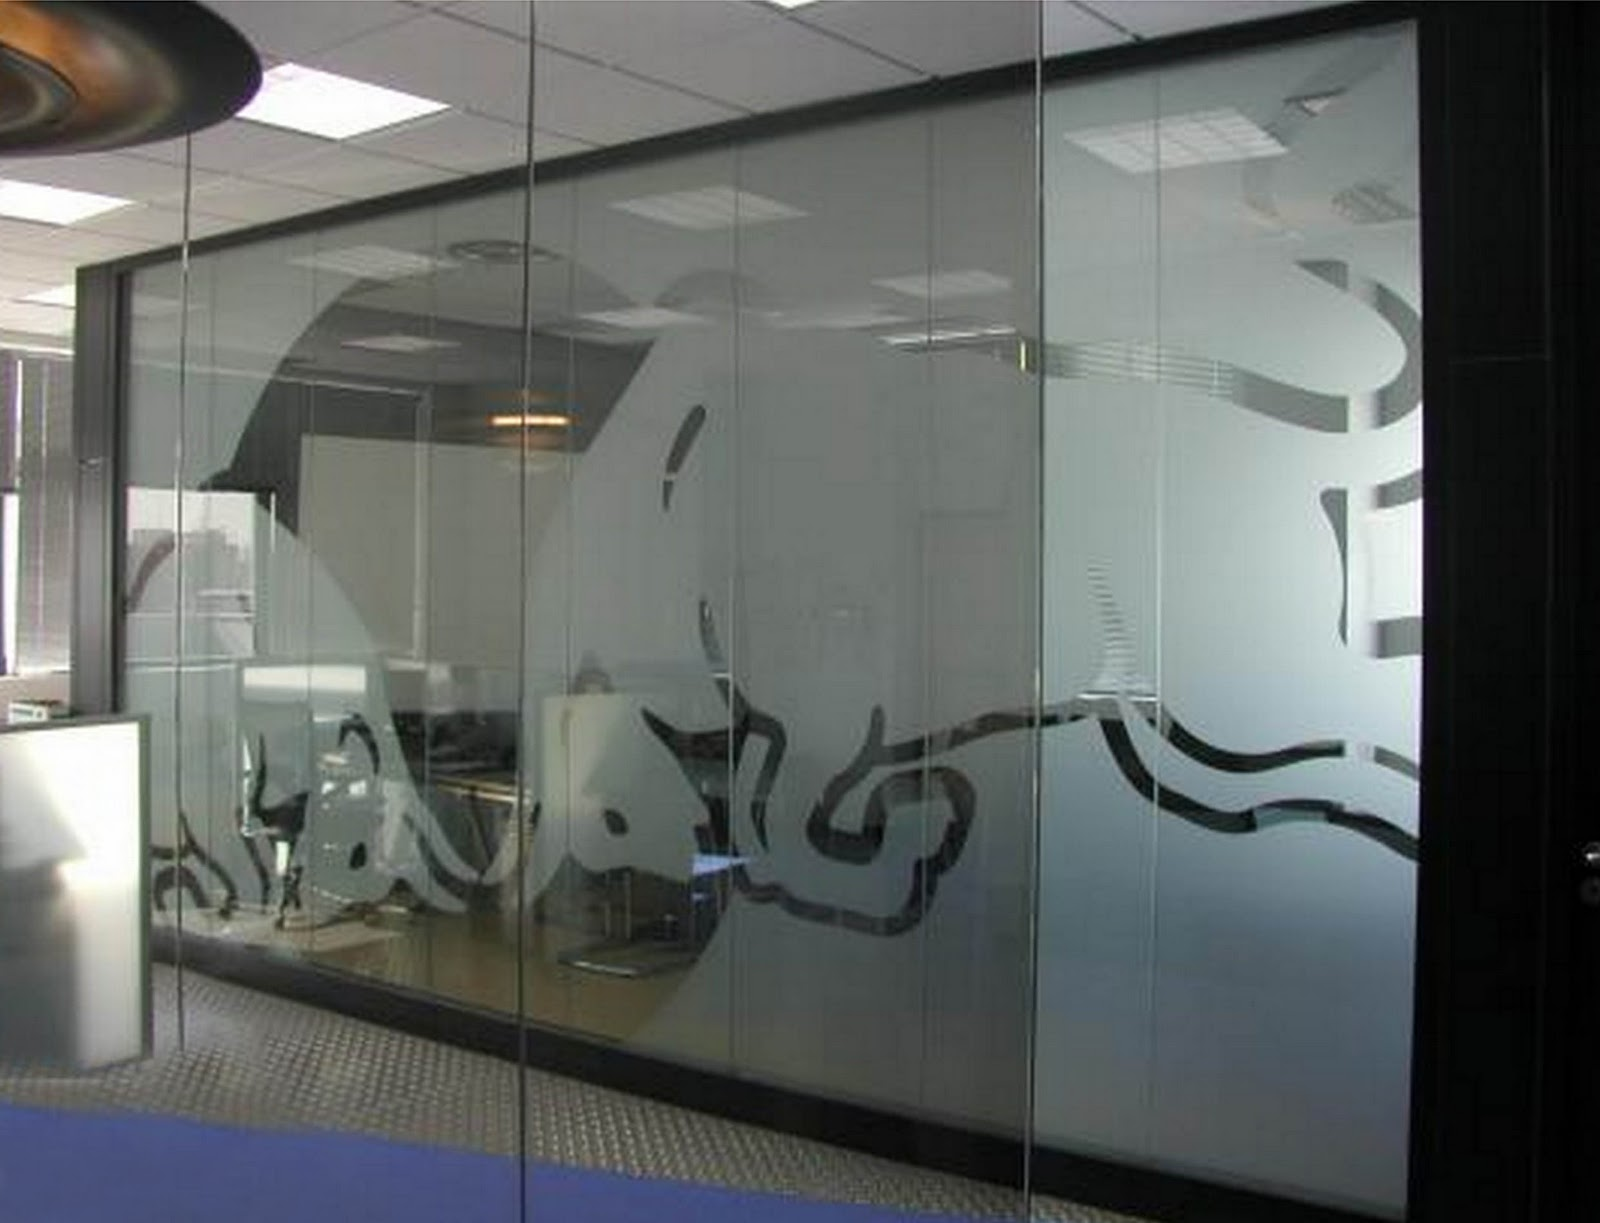 Agencia wtc vinilo arenado en empresas - Vinilo decorativo cristal ...